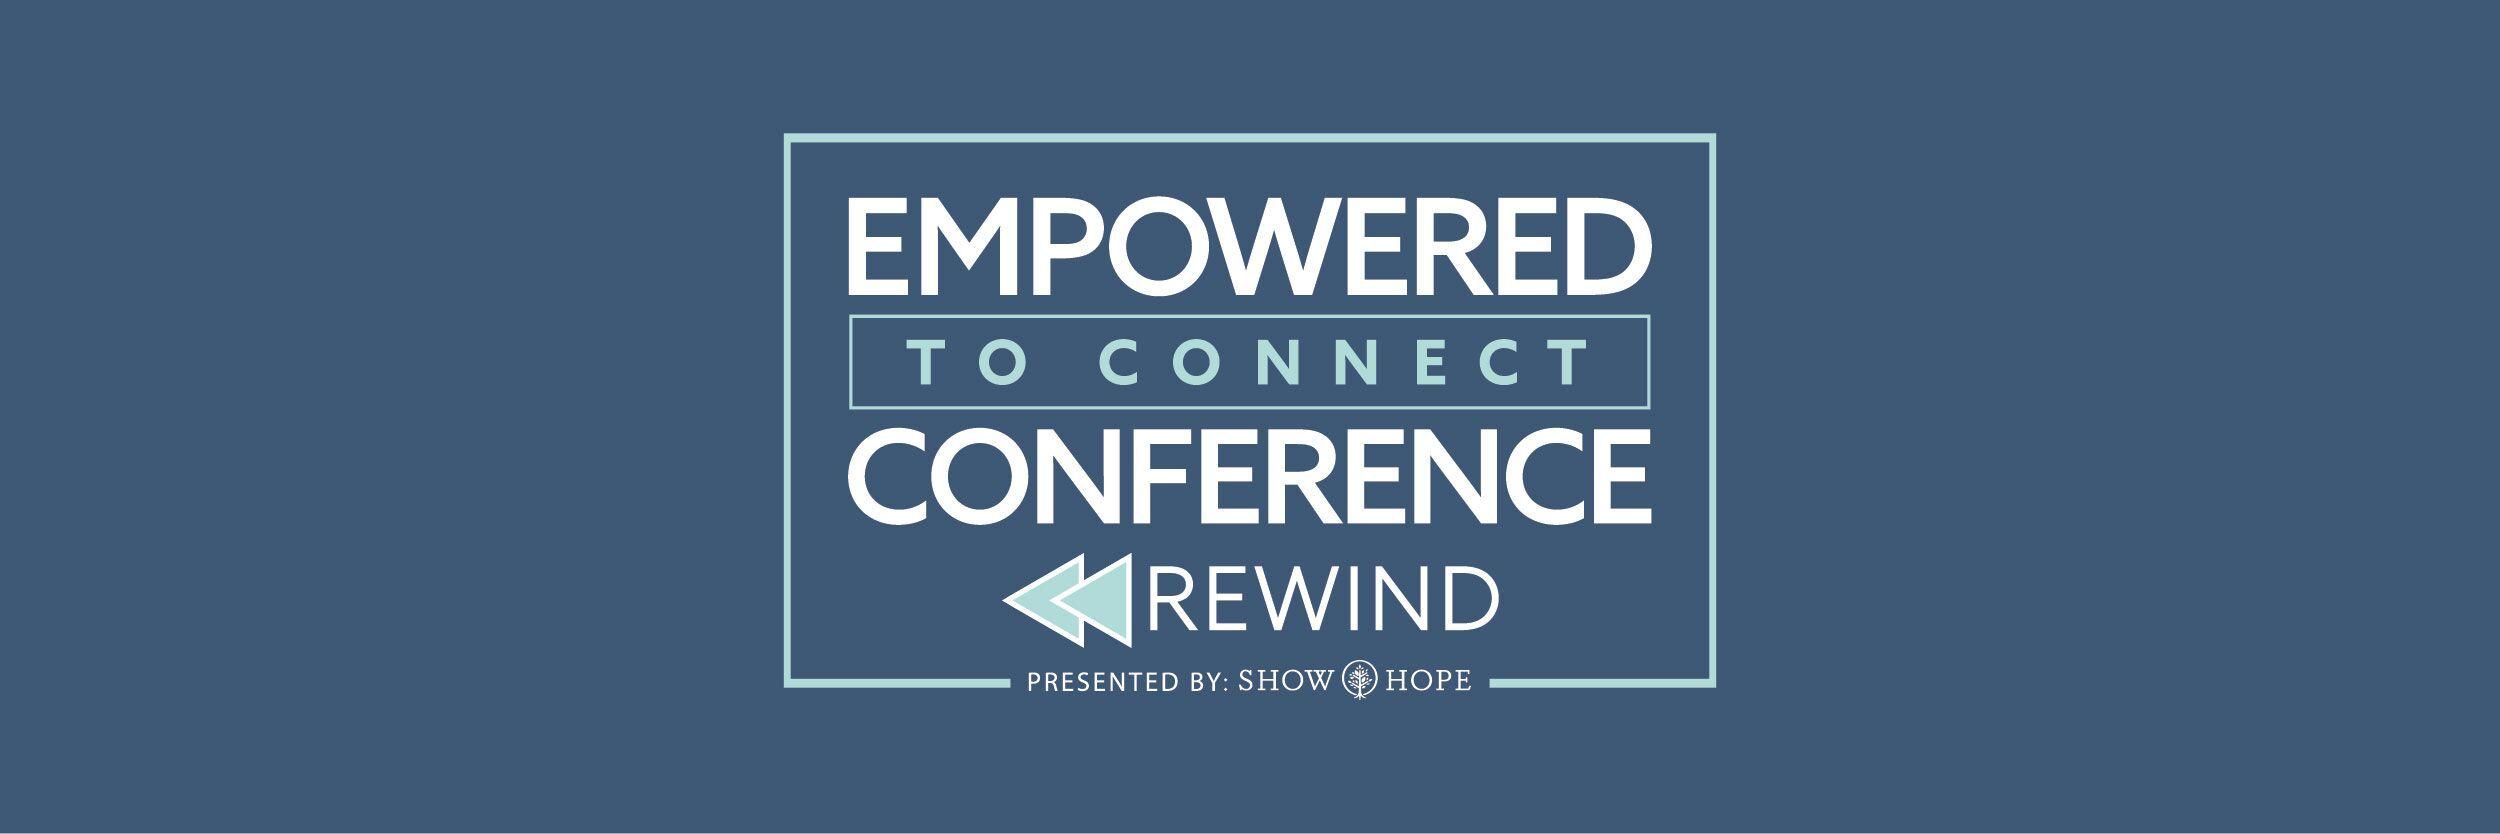 Empowered to Connect Rewind